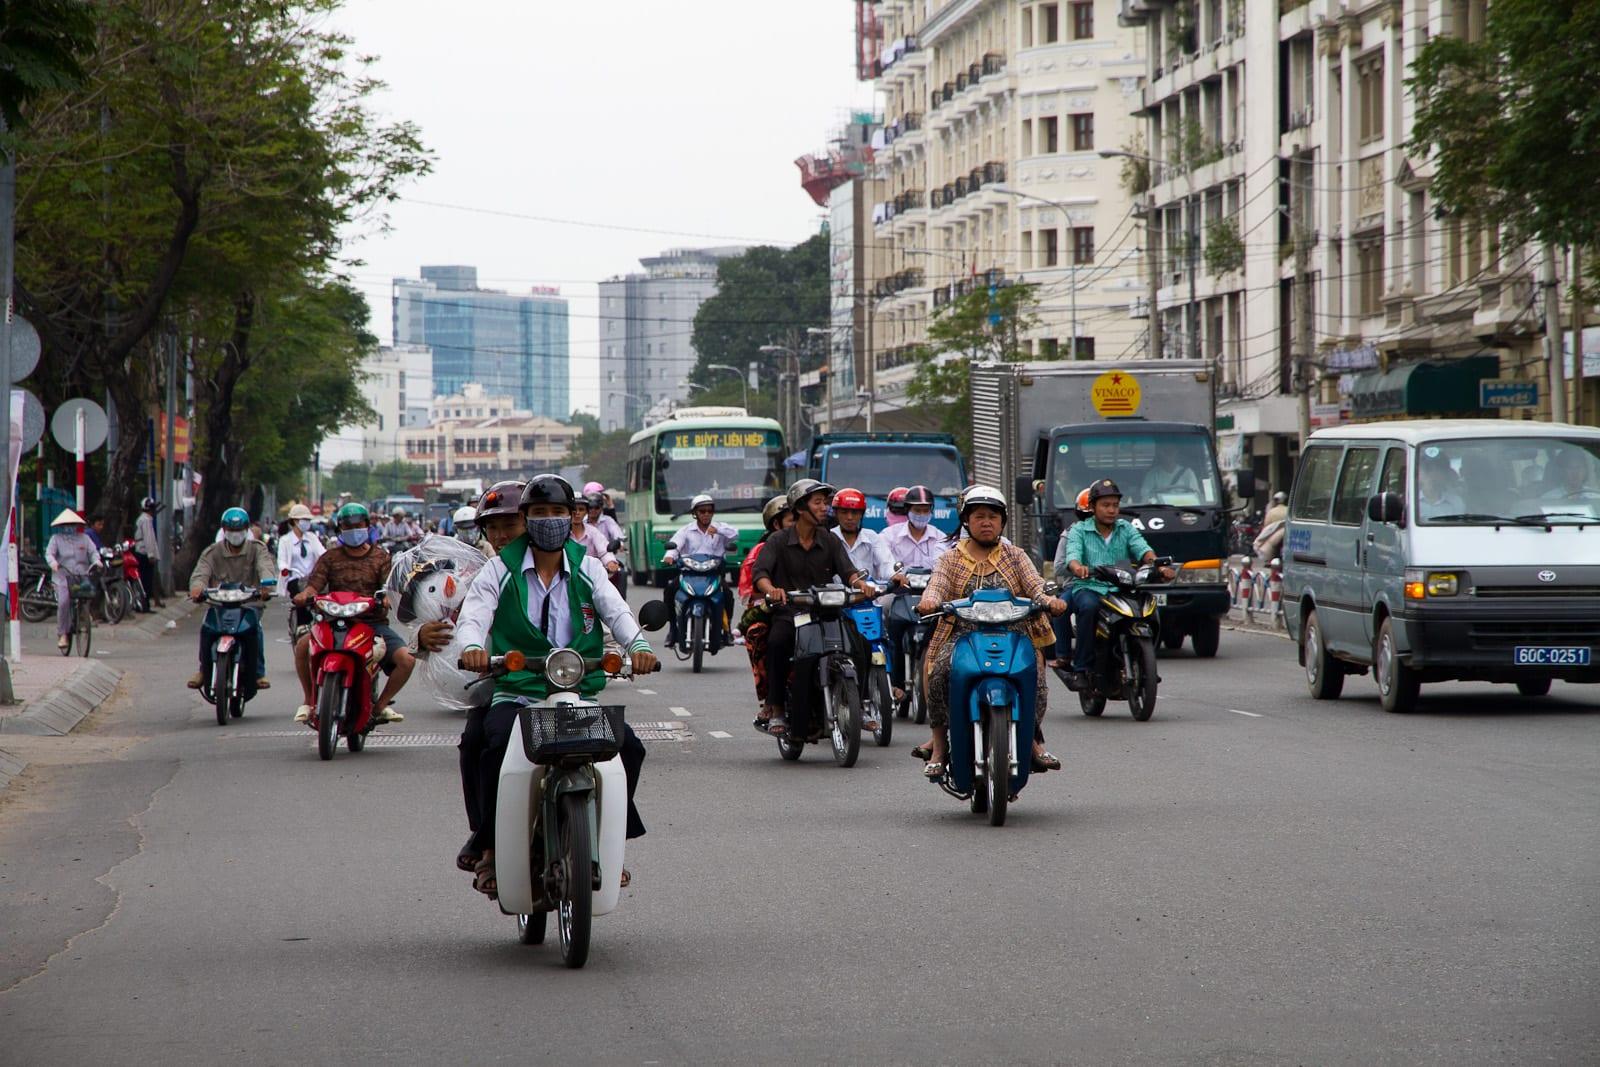 Image of motorbike riders in Vietnam